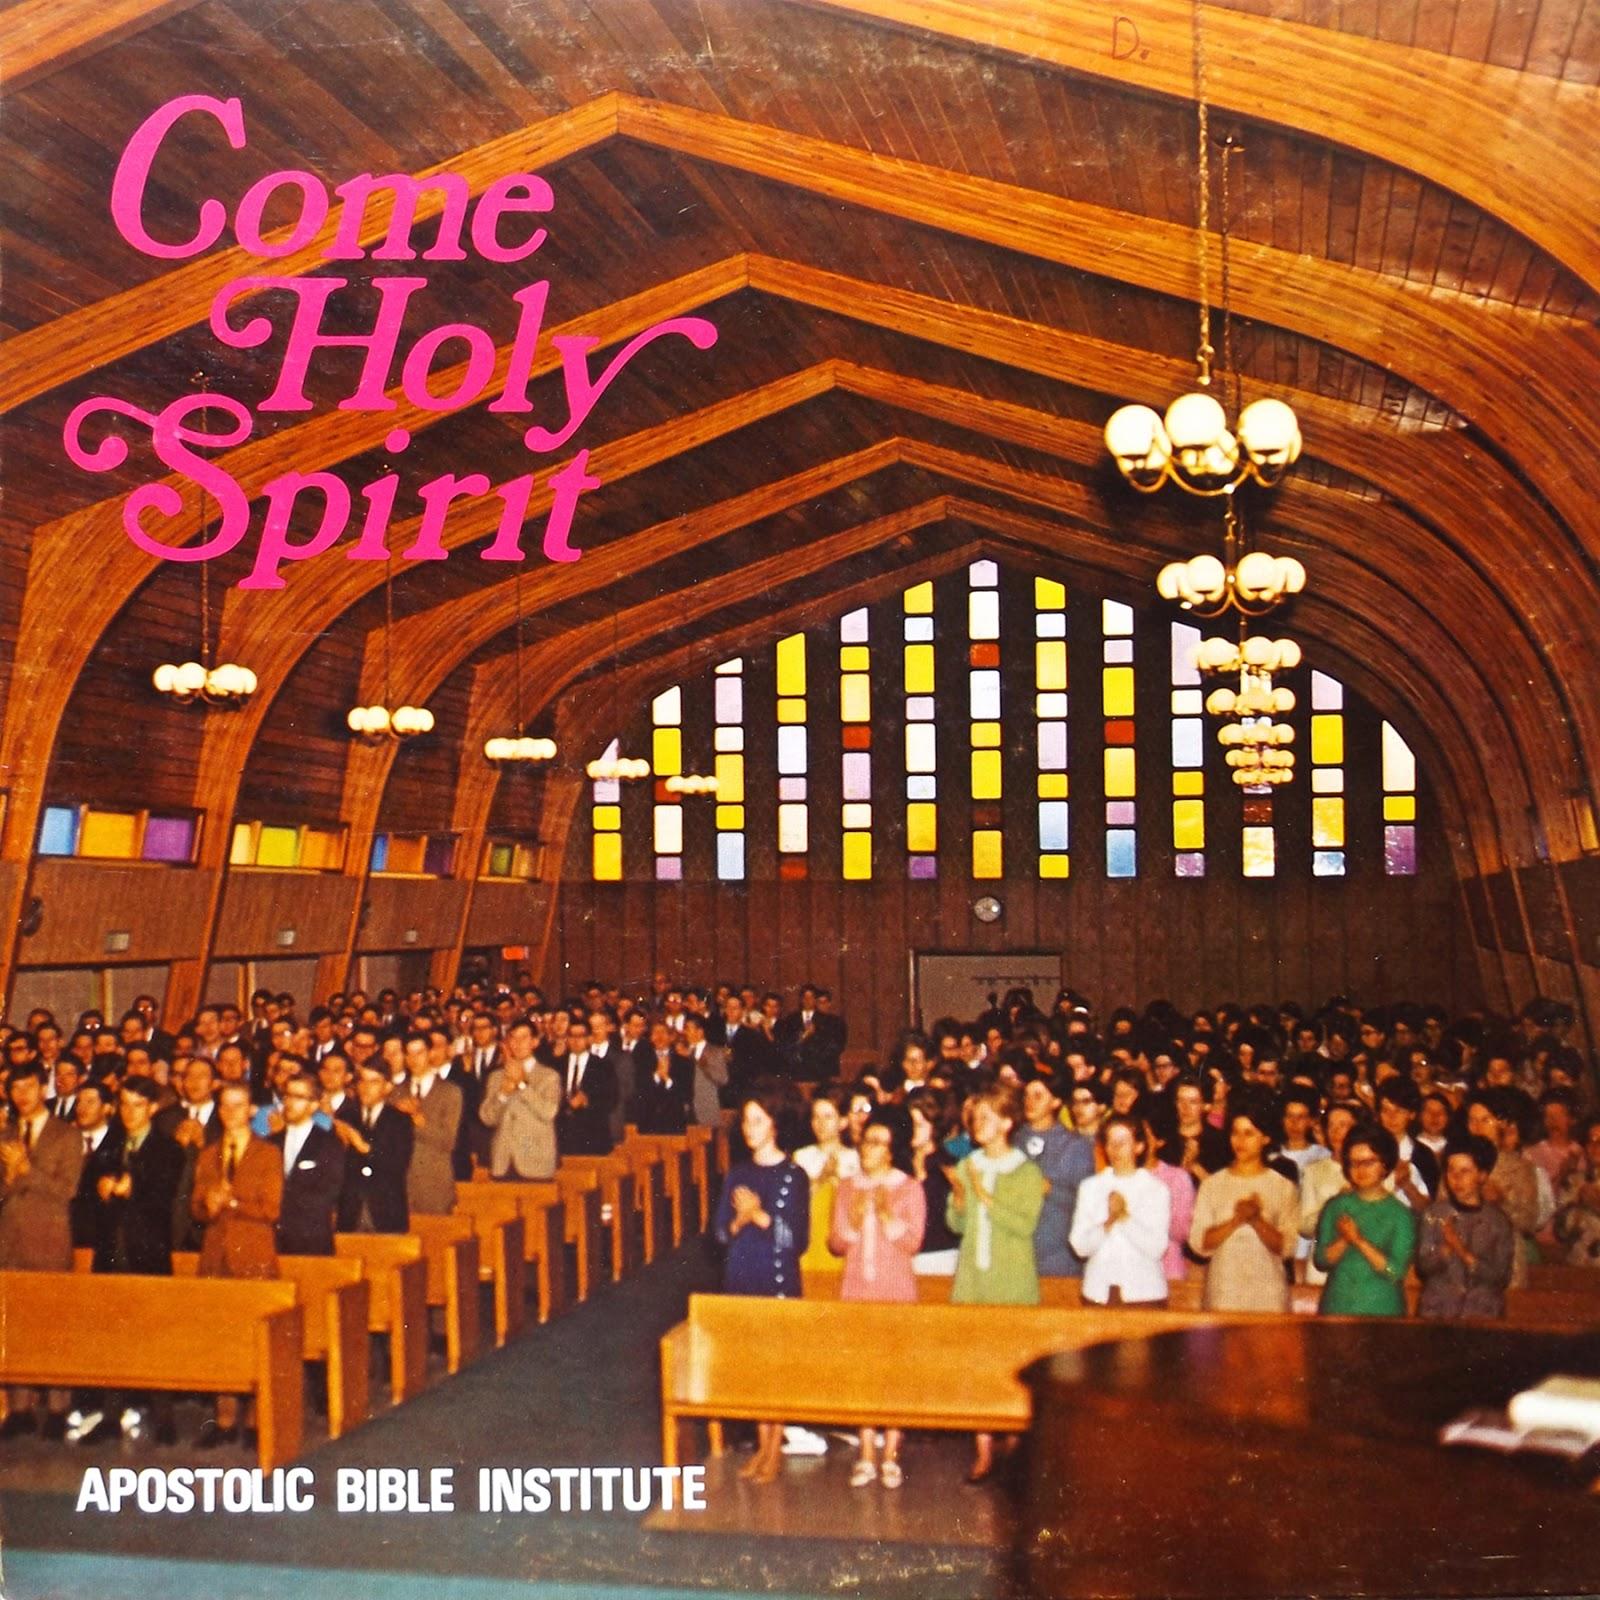 Hymn Time Music Blog: Apostolic Bible Institute-Come Holy Spirit